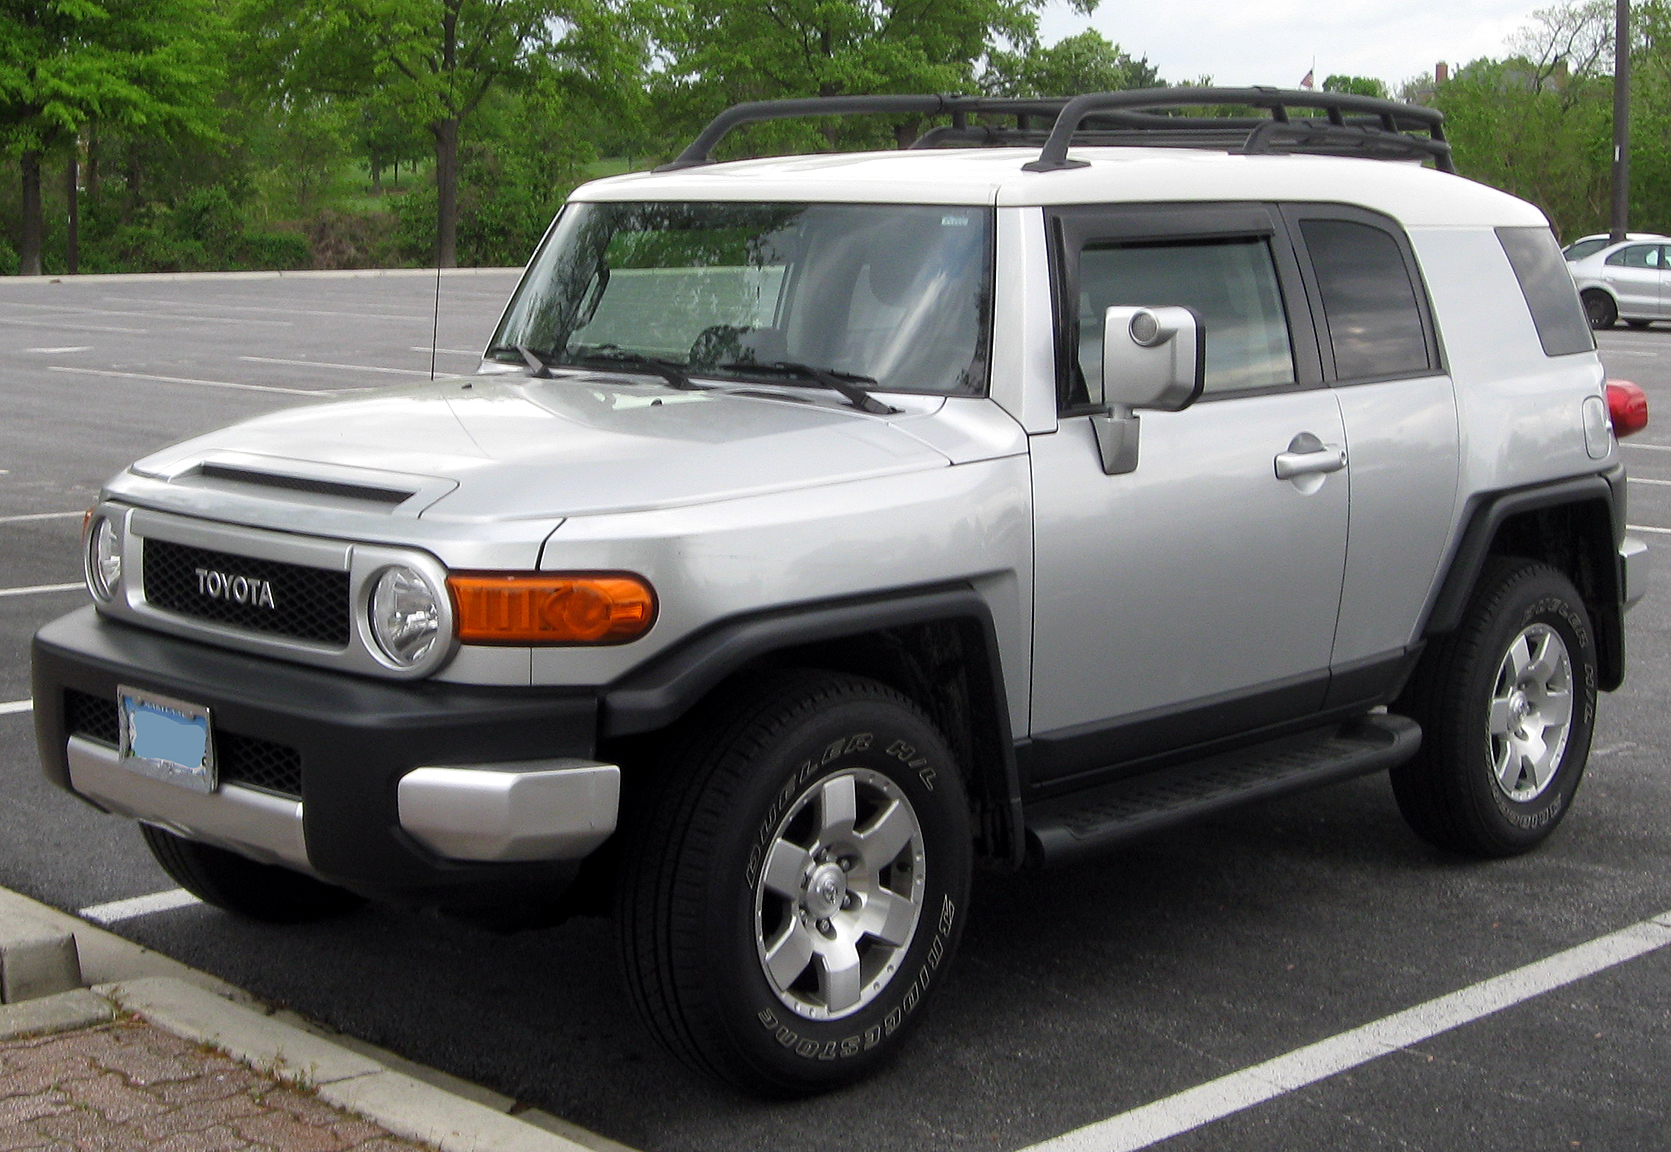 File Toyota Fj Cruiser 04 27 2011 1 Jpg Wikimedia Commons